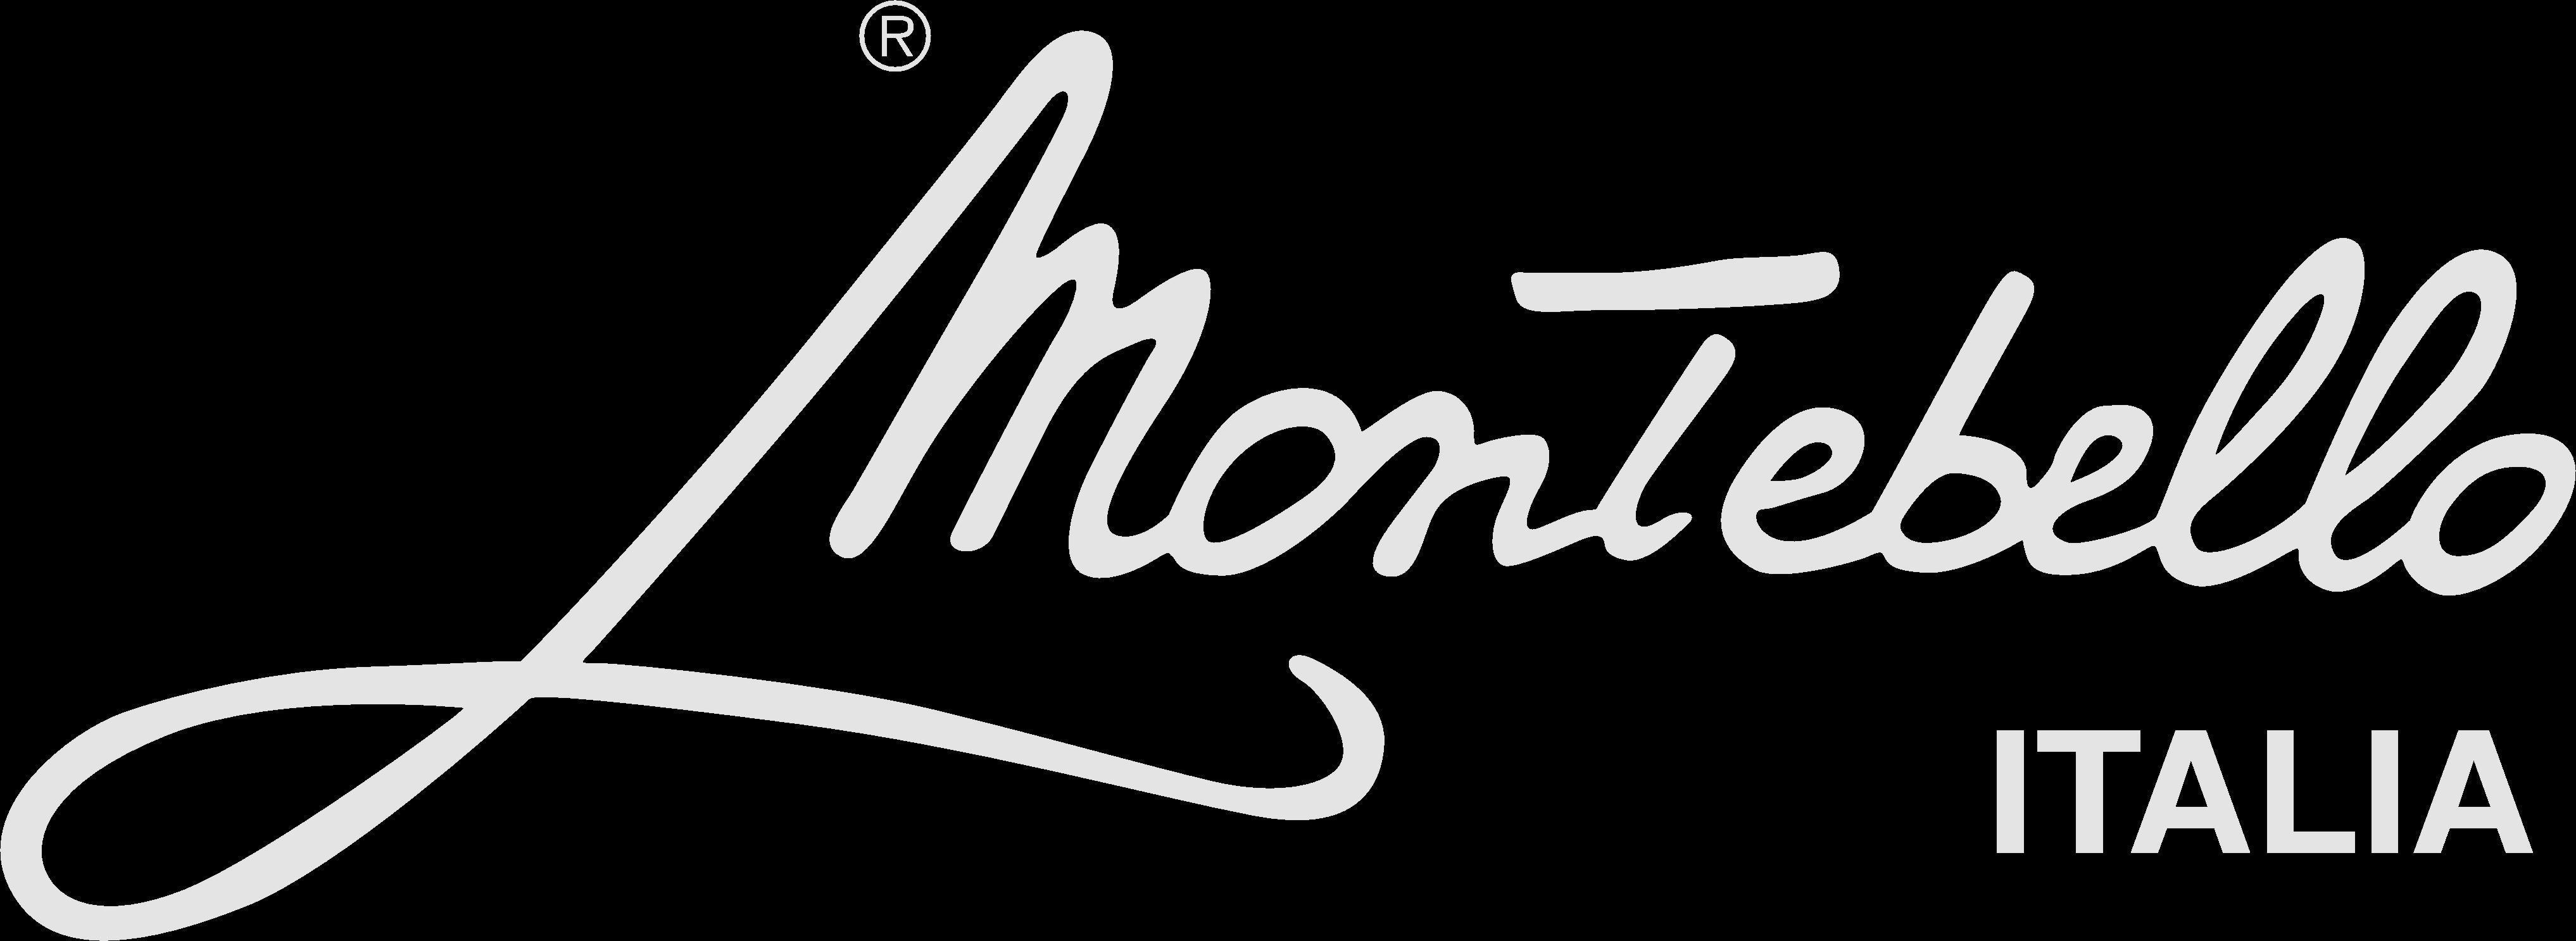 CONCERIA MONTEBELLO S.P.A.